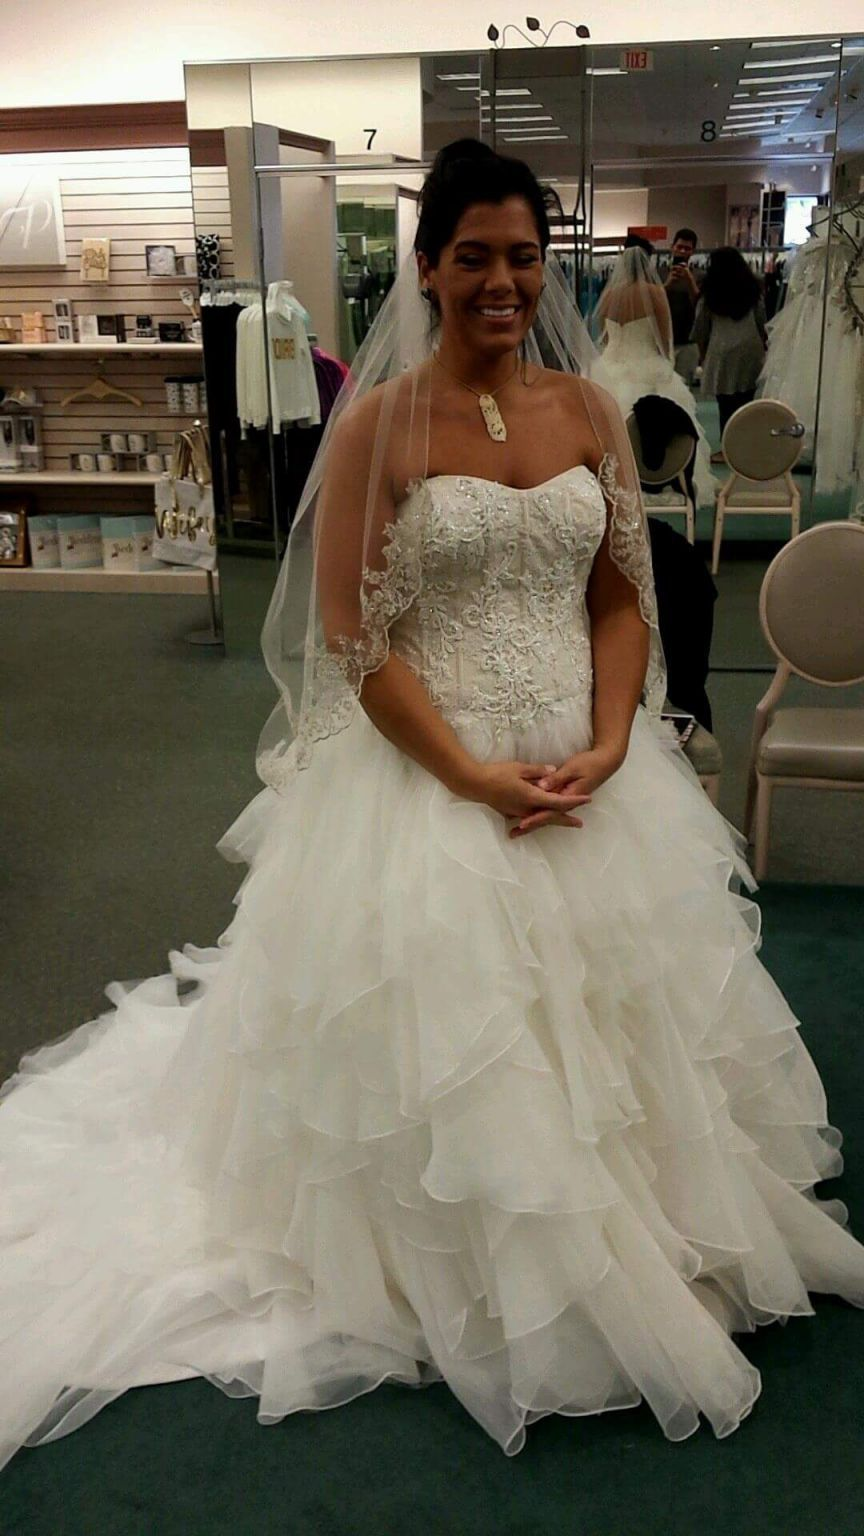 15d63aeb9492 Oleg Cassini cwg568 14 Mermaid Wedding, Lace Weddings, Lace Wedding Dress